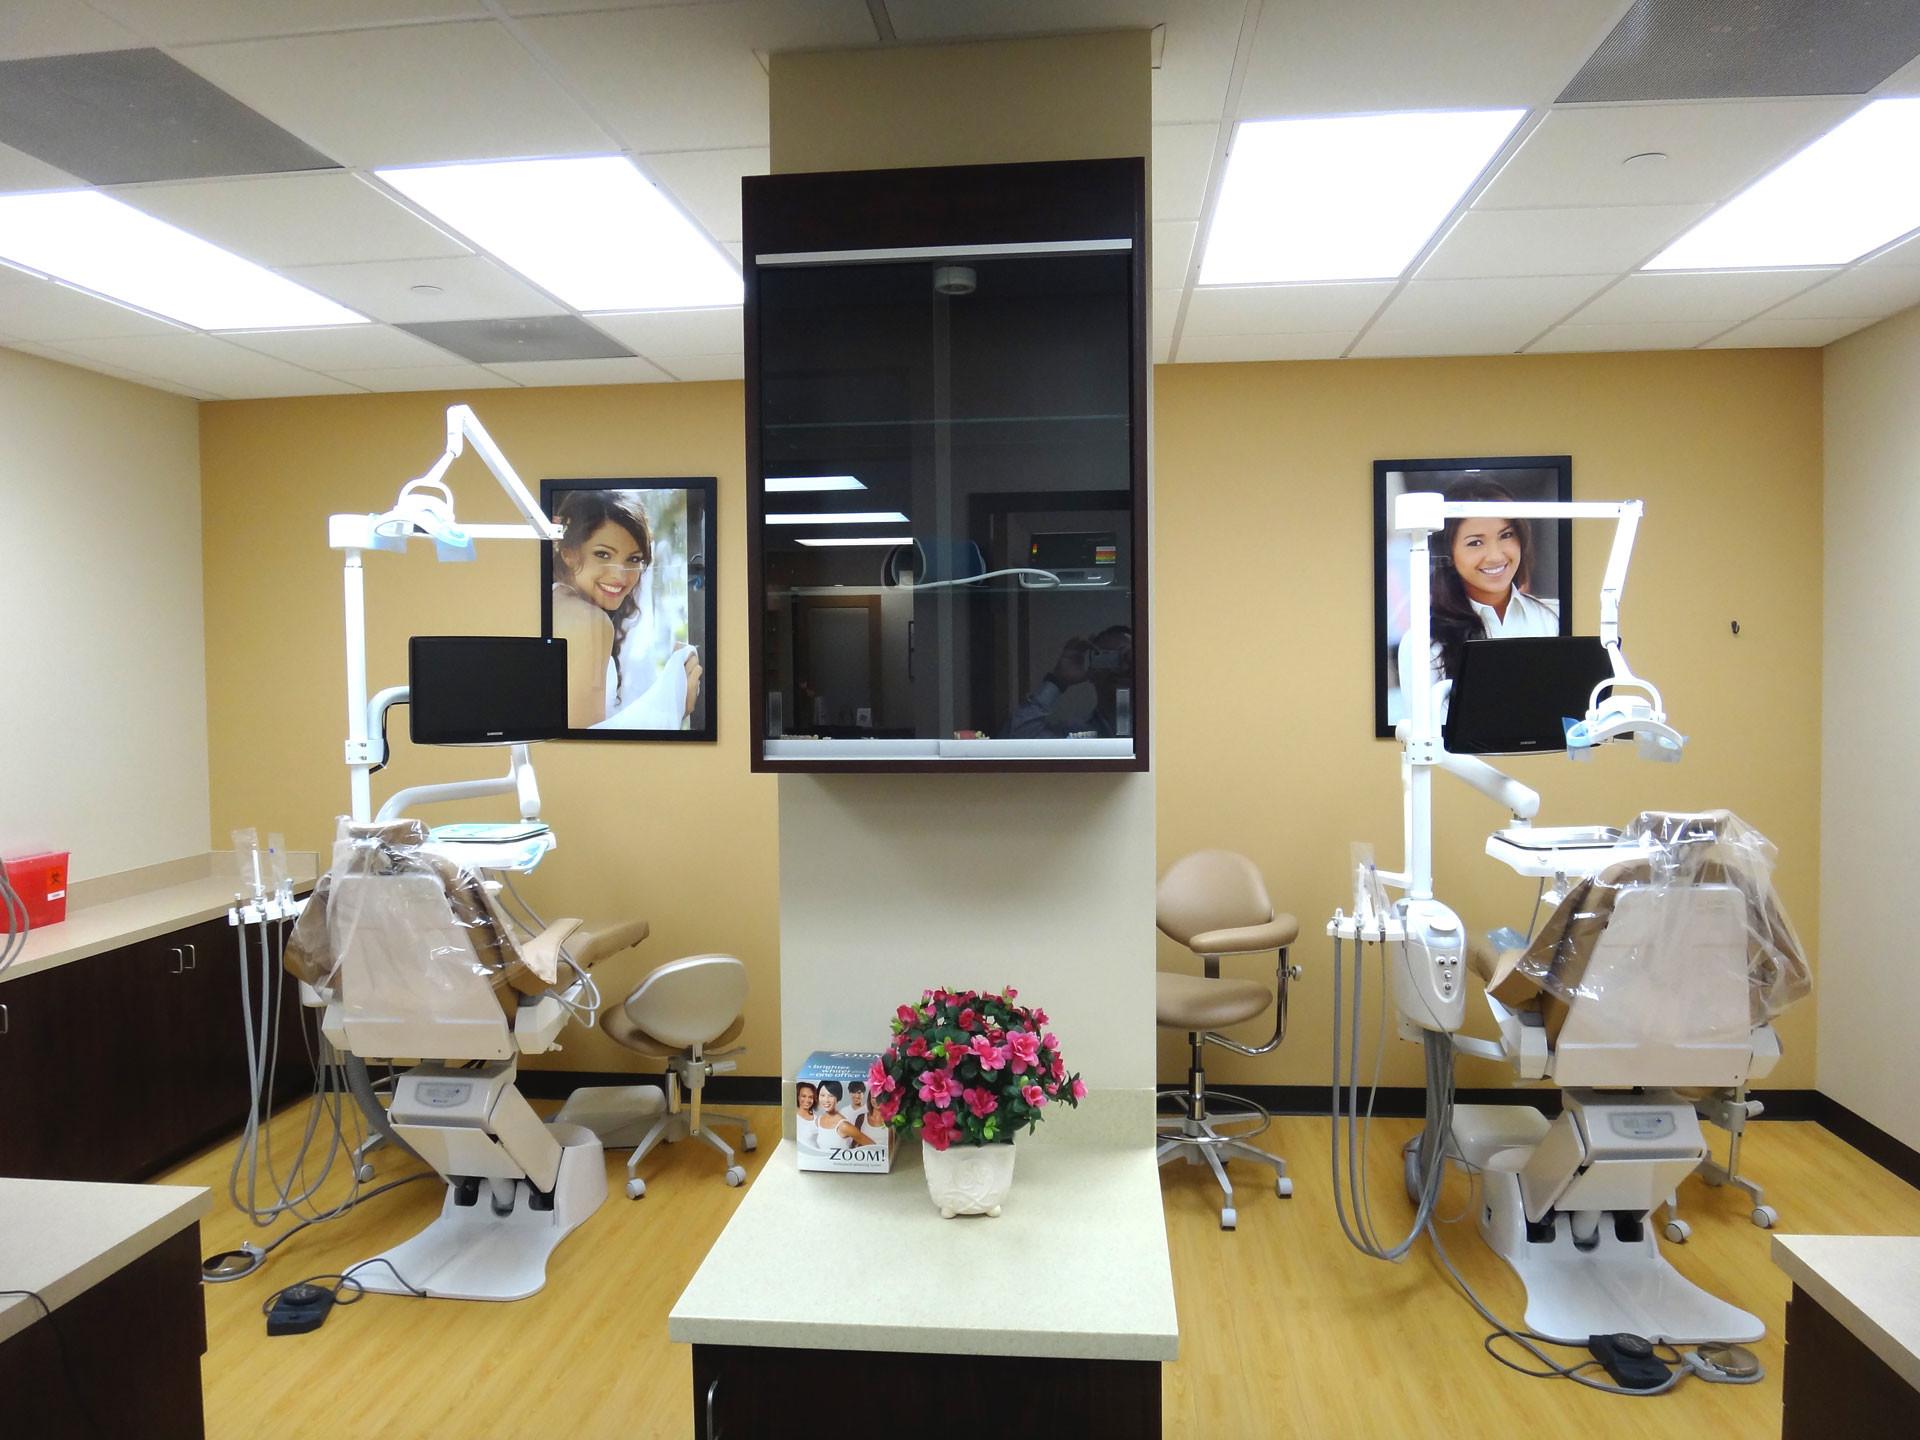 Dental Office Wallpaper 51 Images